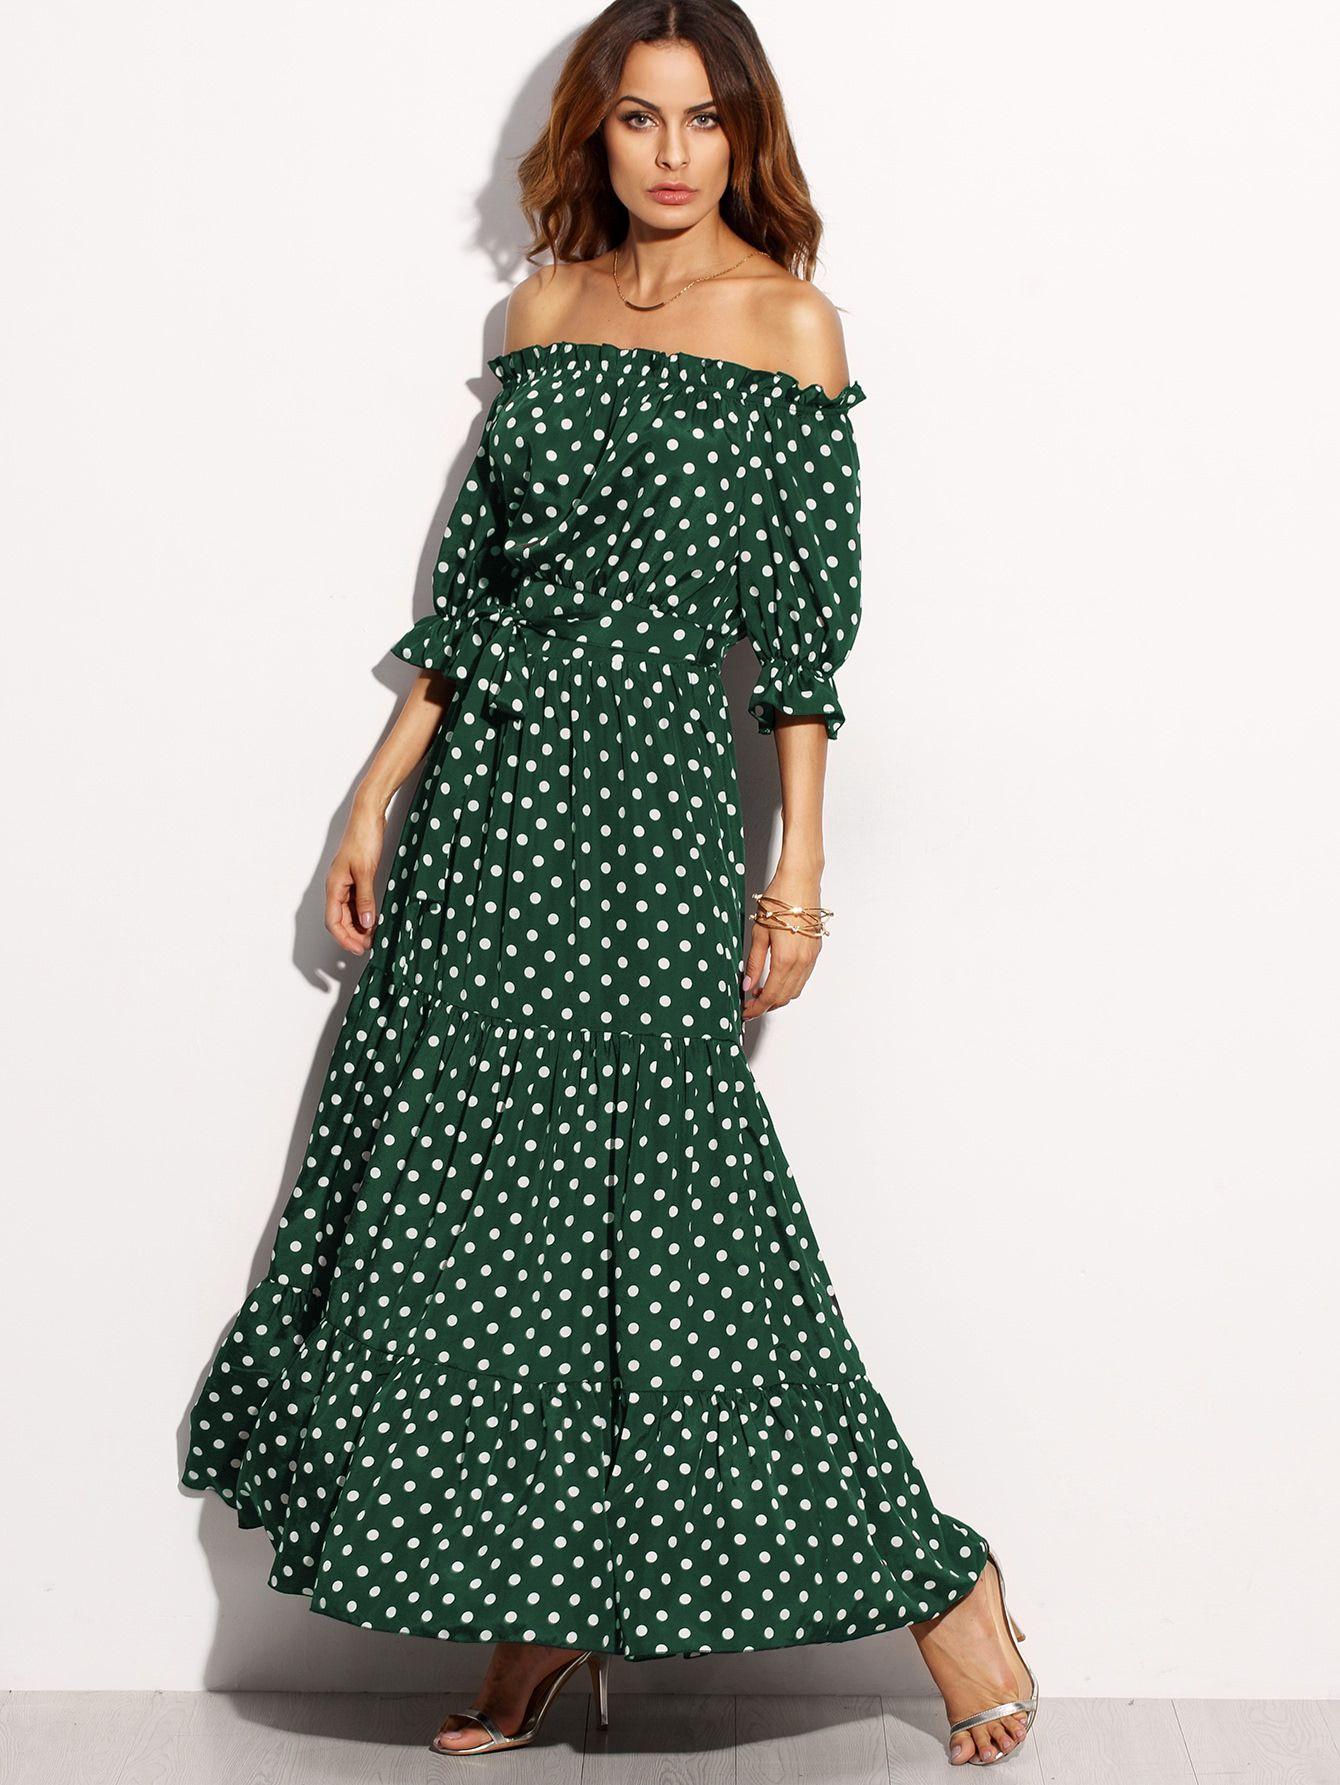 Polka Dot Bardot Neckline Tie Waist Dress